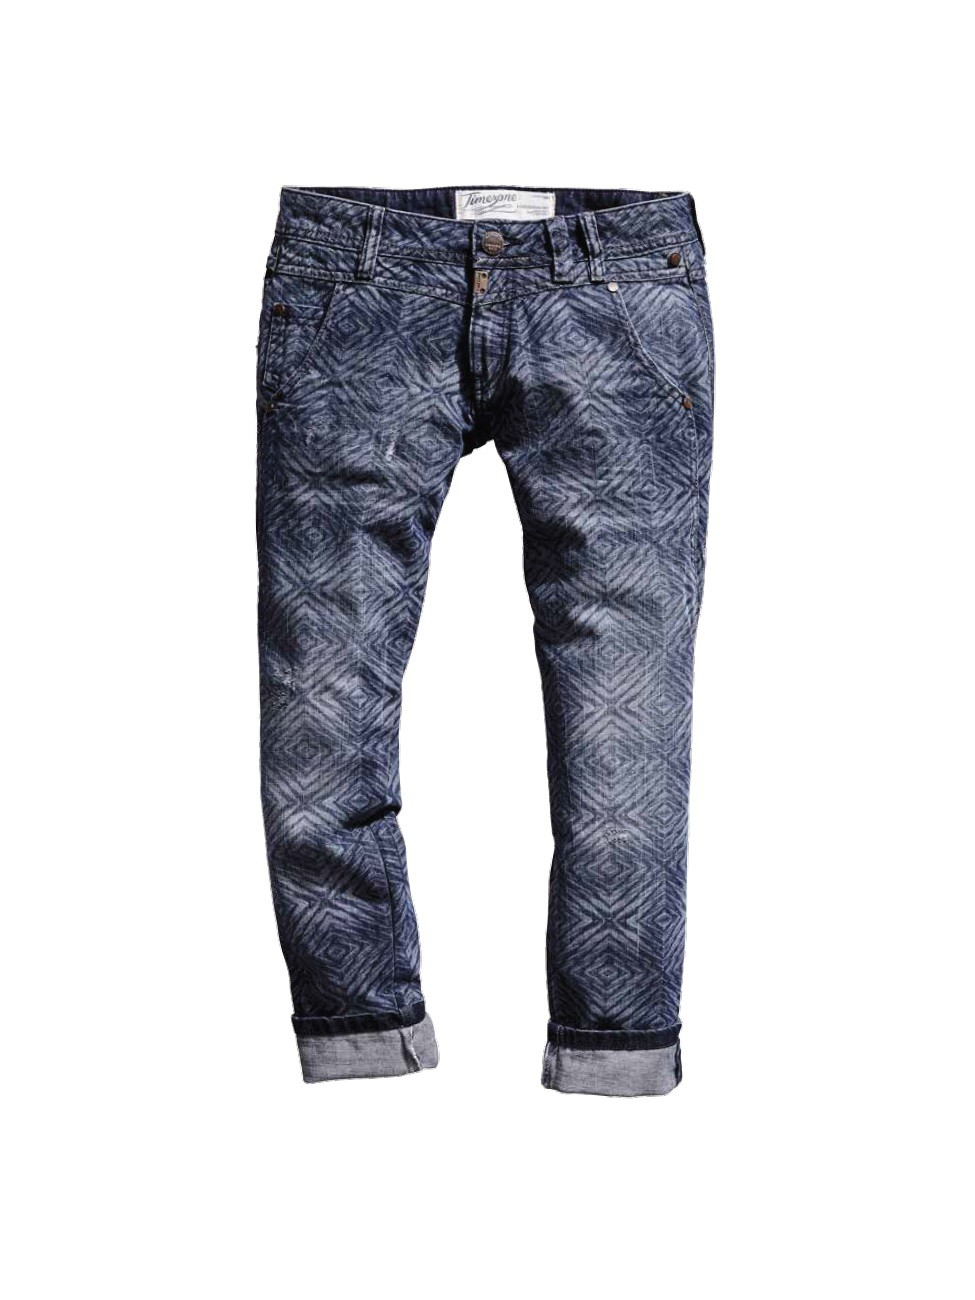 timezone damen 7 8 jeans nalitz 16 5455 slim fit blue diamond laser neu ebay. Black Bedroom Furniture Sets. Home Design Ideas